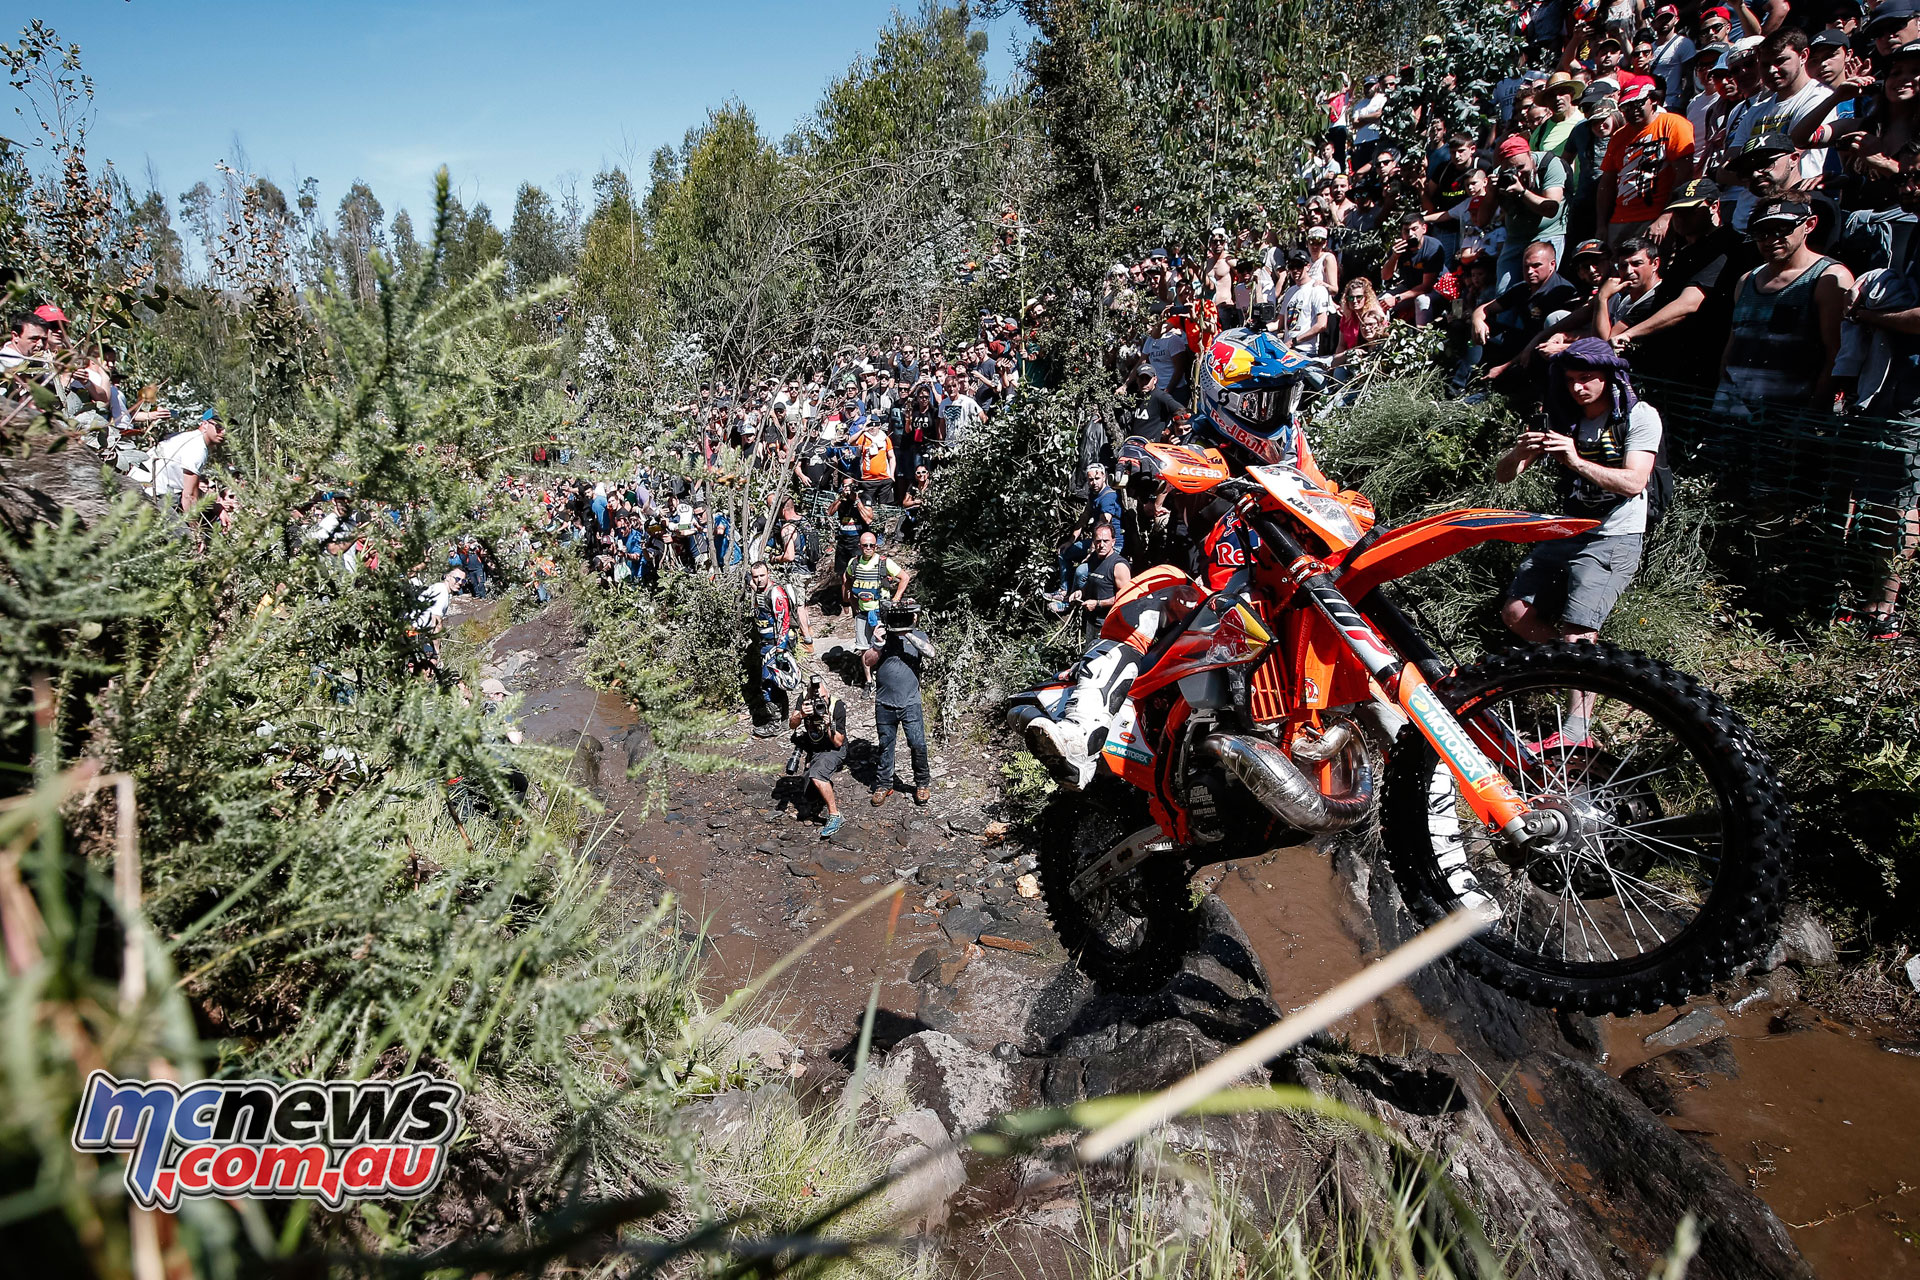 WESS Rnd Extreme XL Lagares Josep Garcia FM